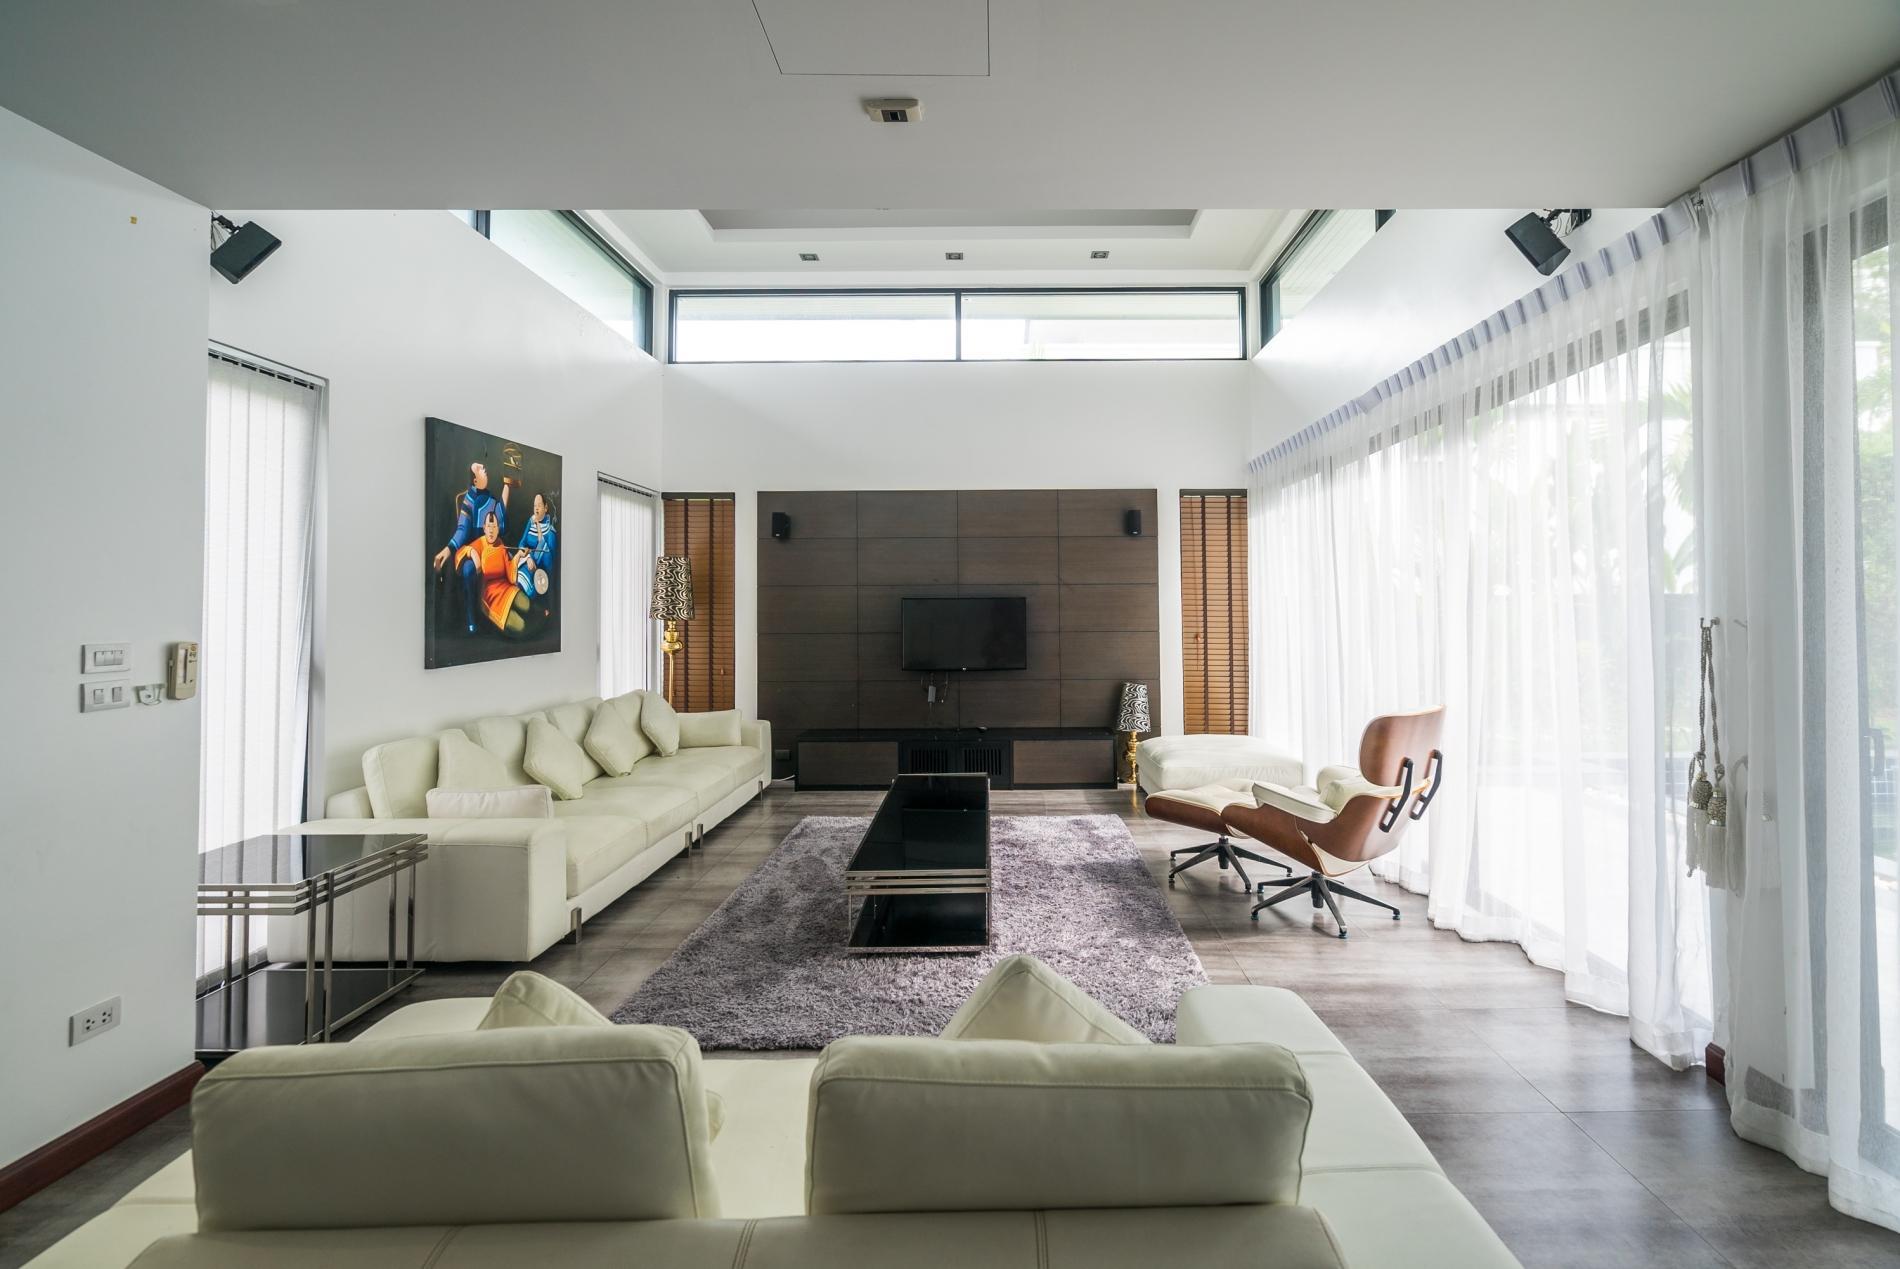 Apartment Diamond 272 - Modern 4 br private pool and garden villa photo 20257895